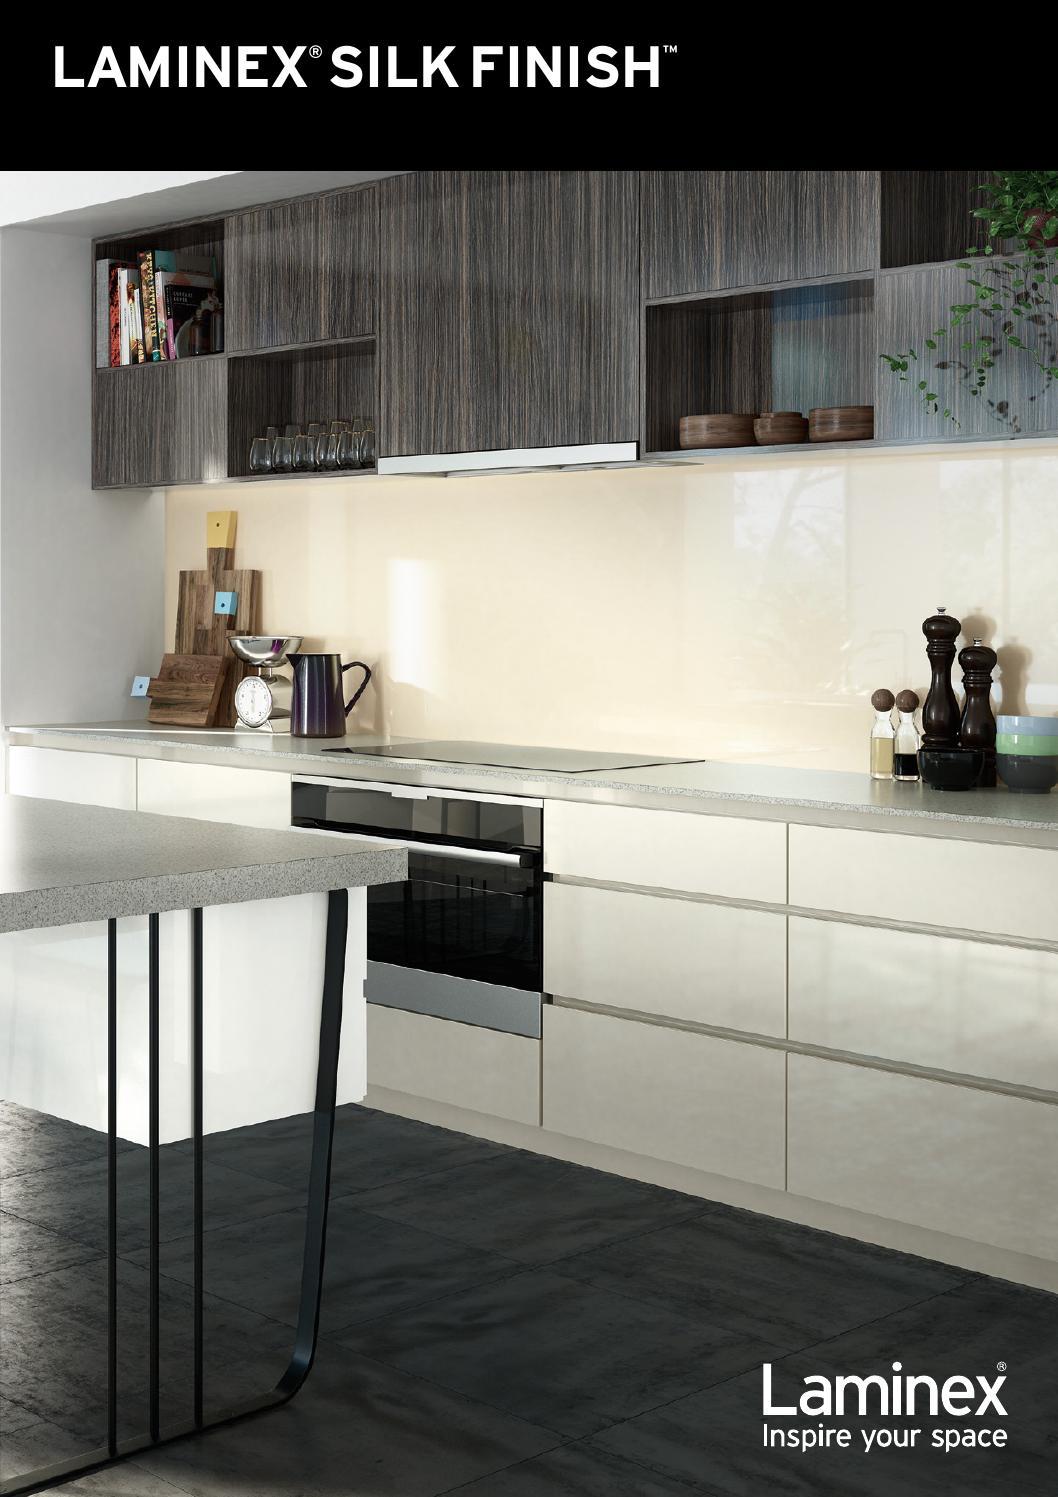 Laminex Silk Finish Doors By Kitchensbymatric Issuu